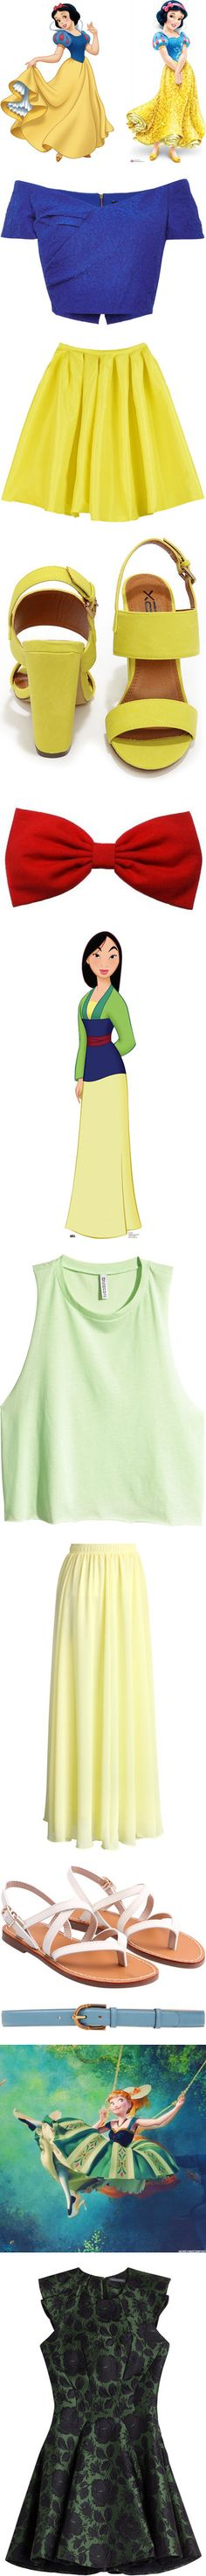 Designer Clothes, Shoes & Bags for Women Drunk Disney, Snow White, Backgrounds, Doodles, Women's Fashion, Crop Tops, Summer Dresses, Polyvore, Stuff To Buy